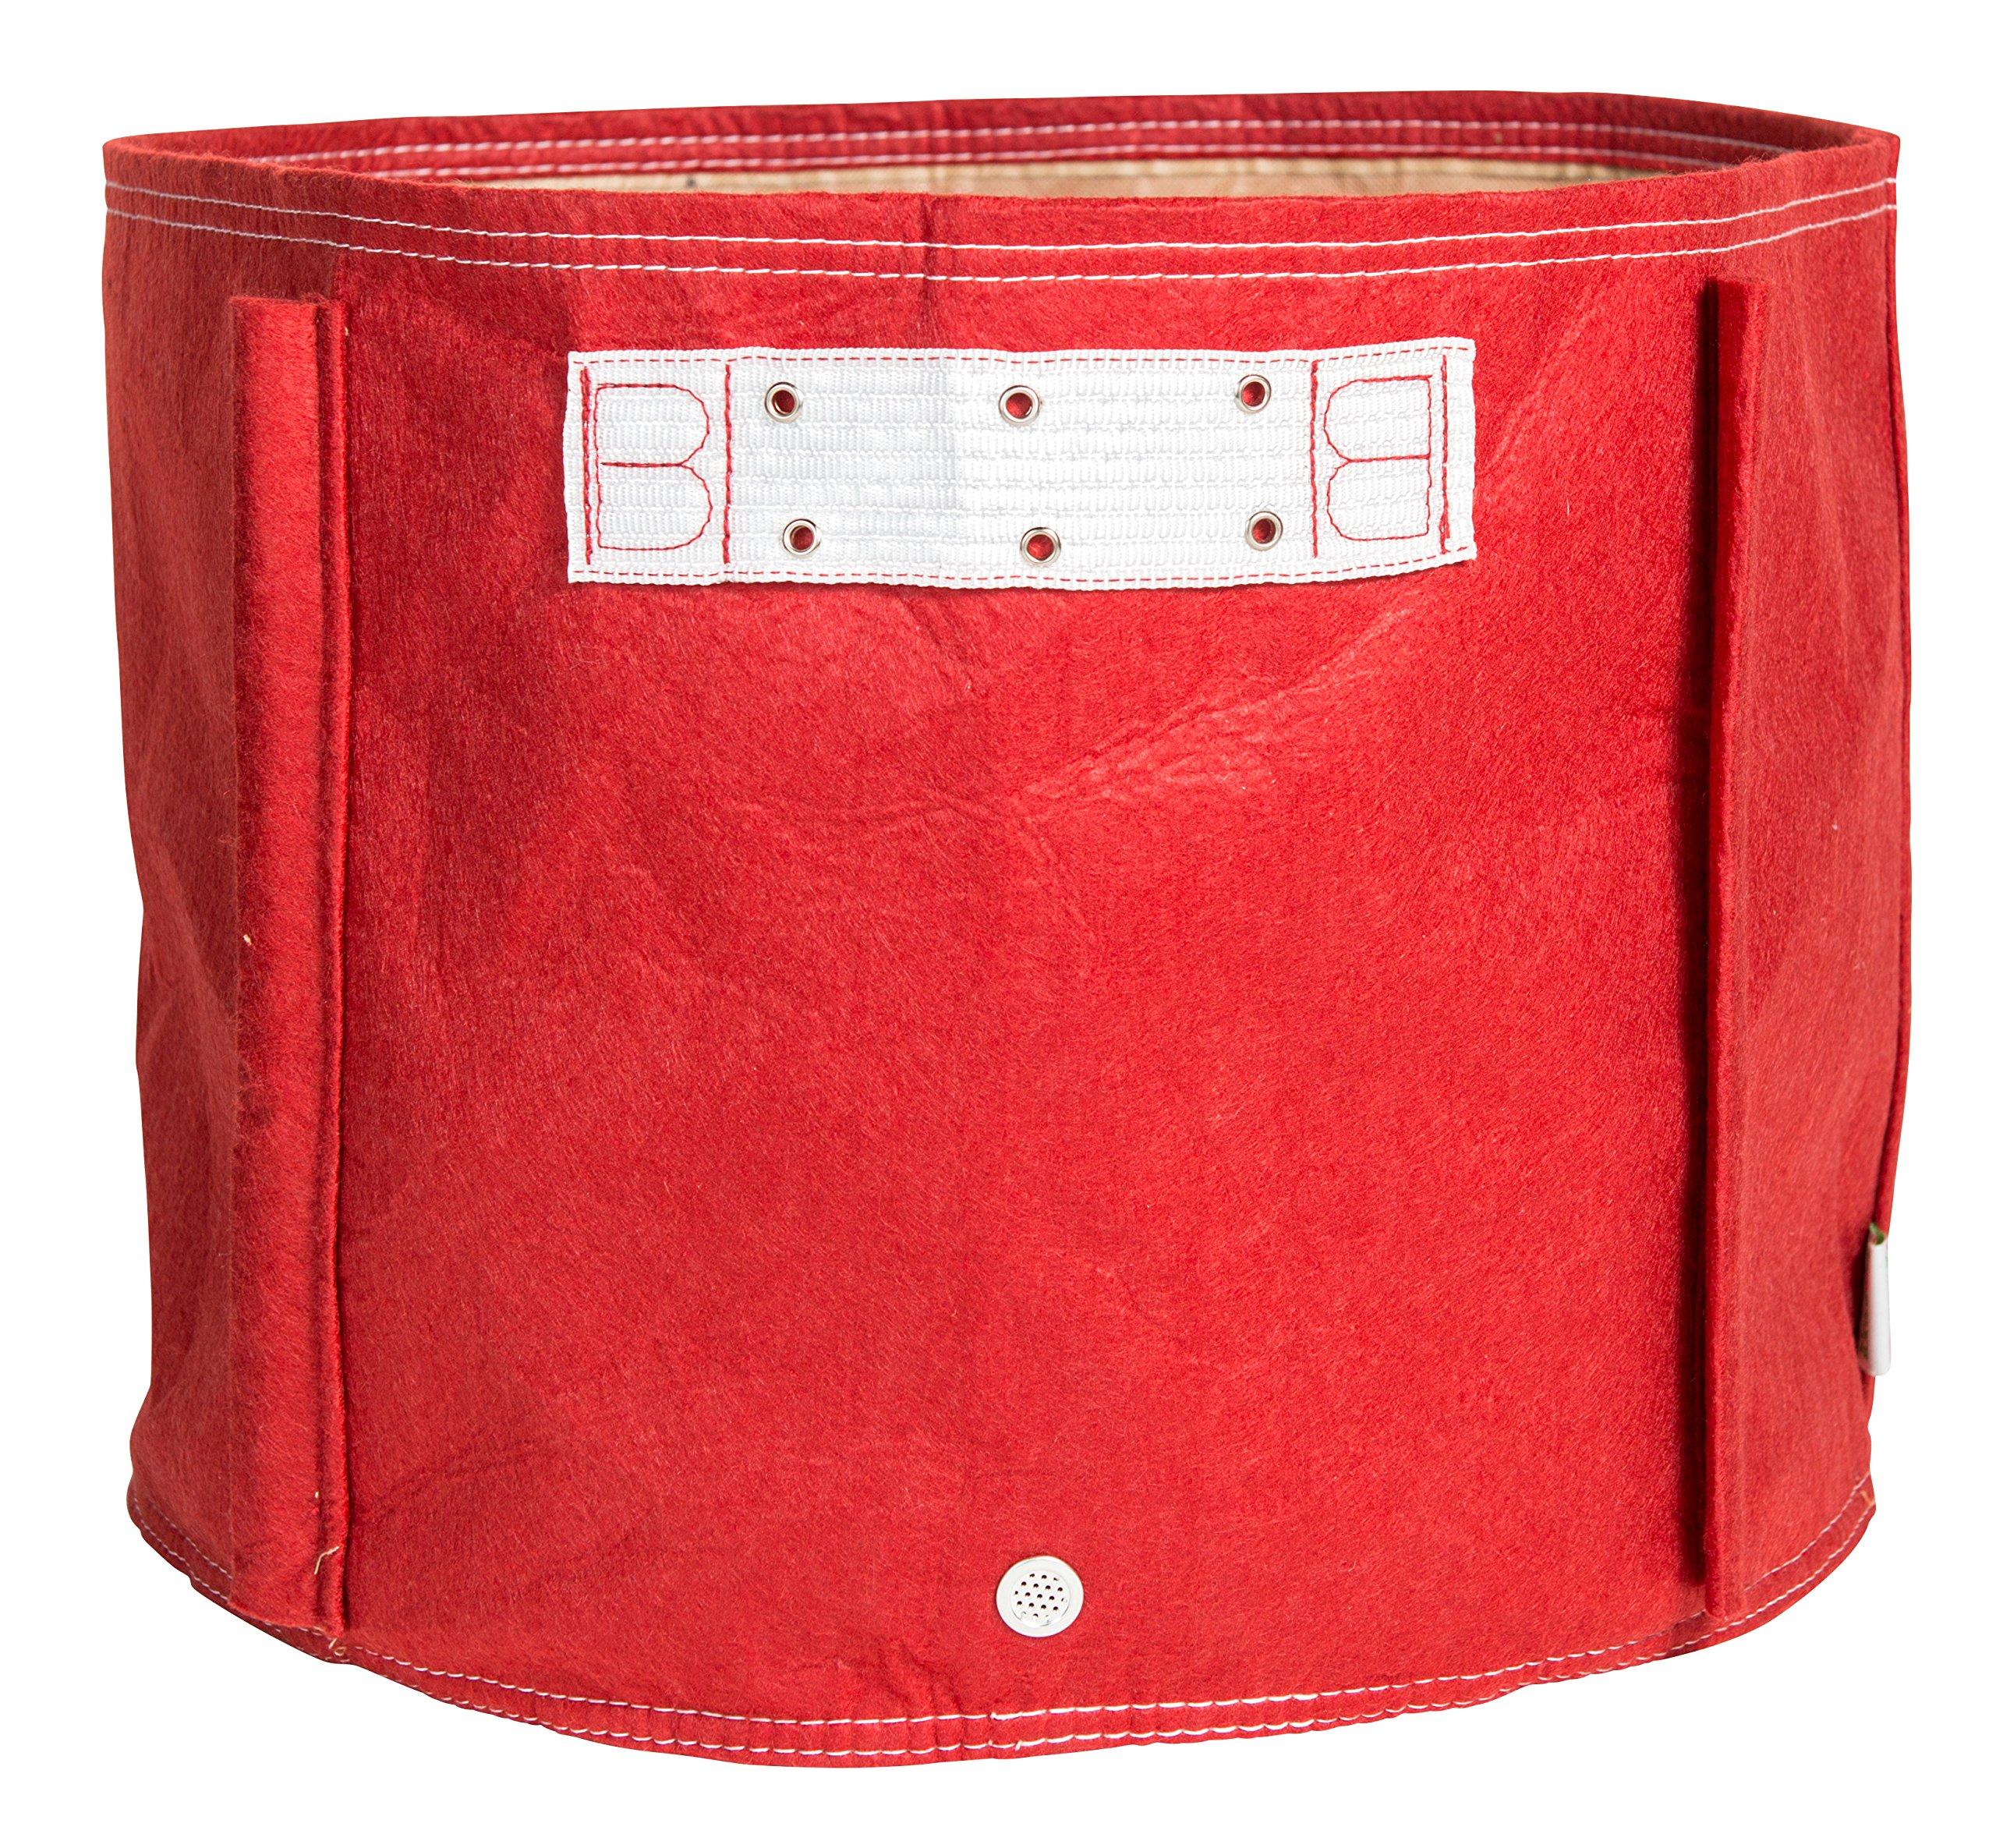 Bloem Tomato Fabric Planter Bag, 15 gallon, Union Red by Bloem